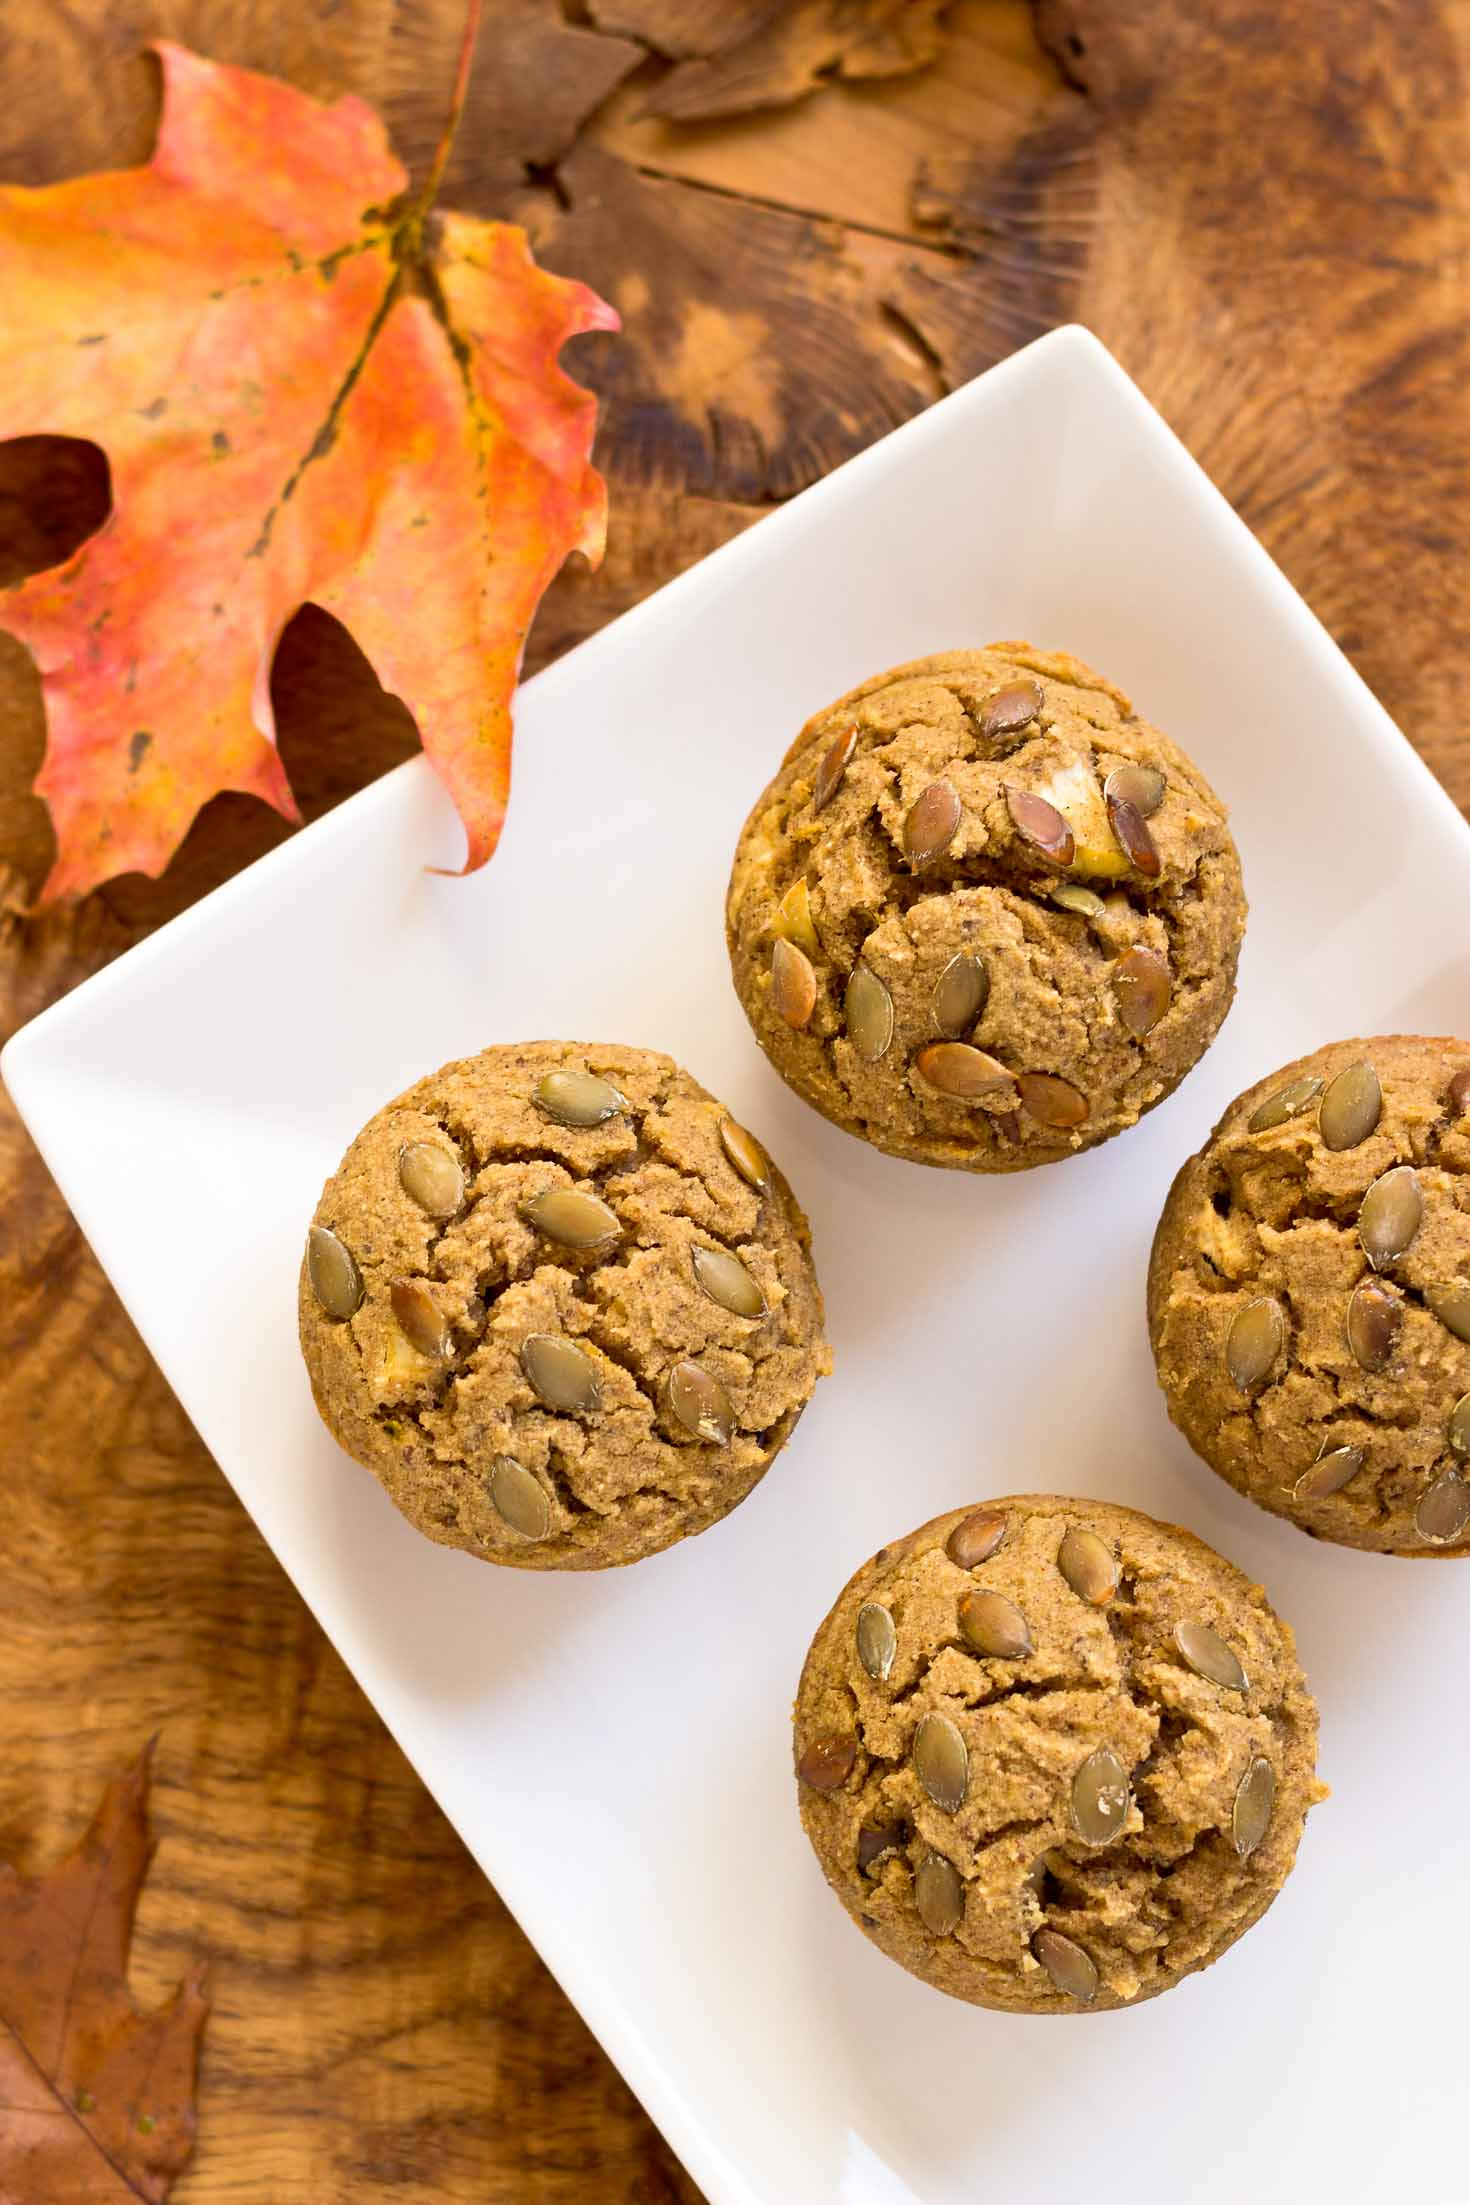 10 Must-Make Gluten-free Vegan Fall Recipes